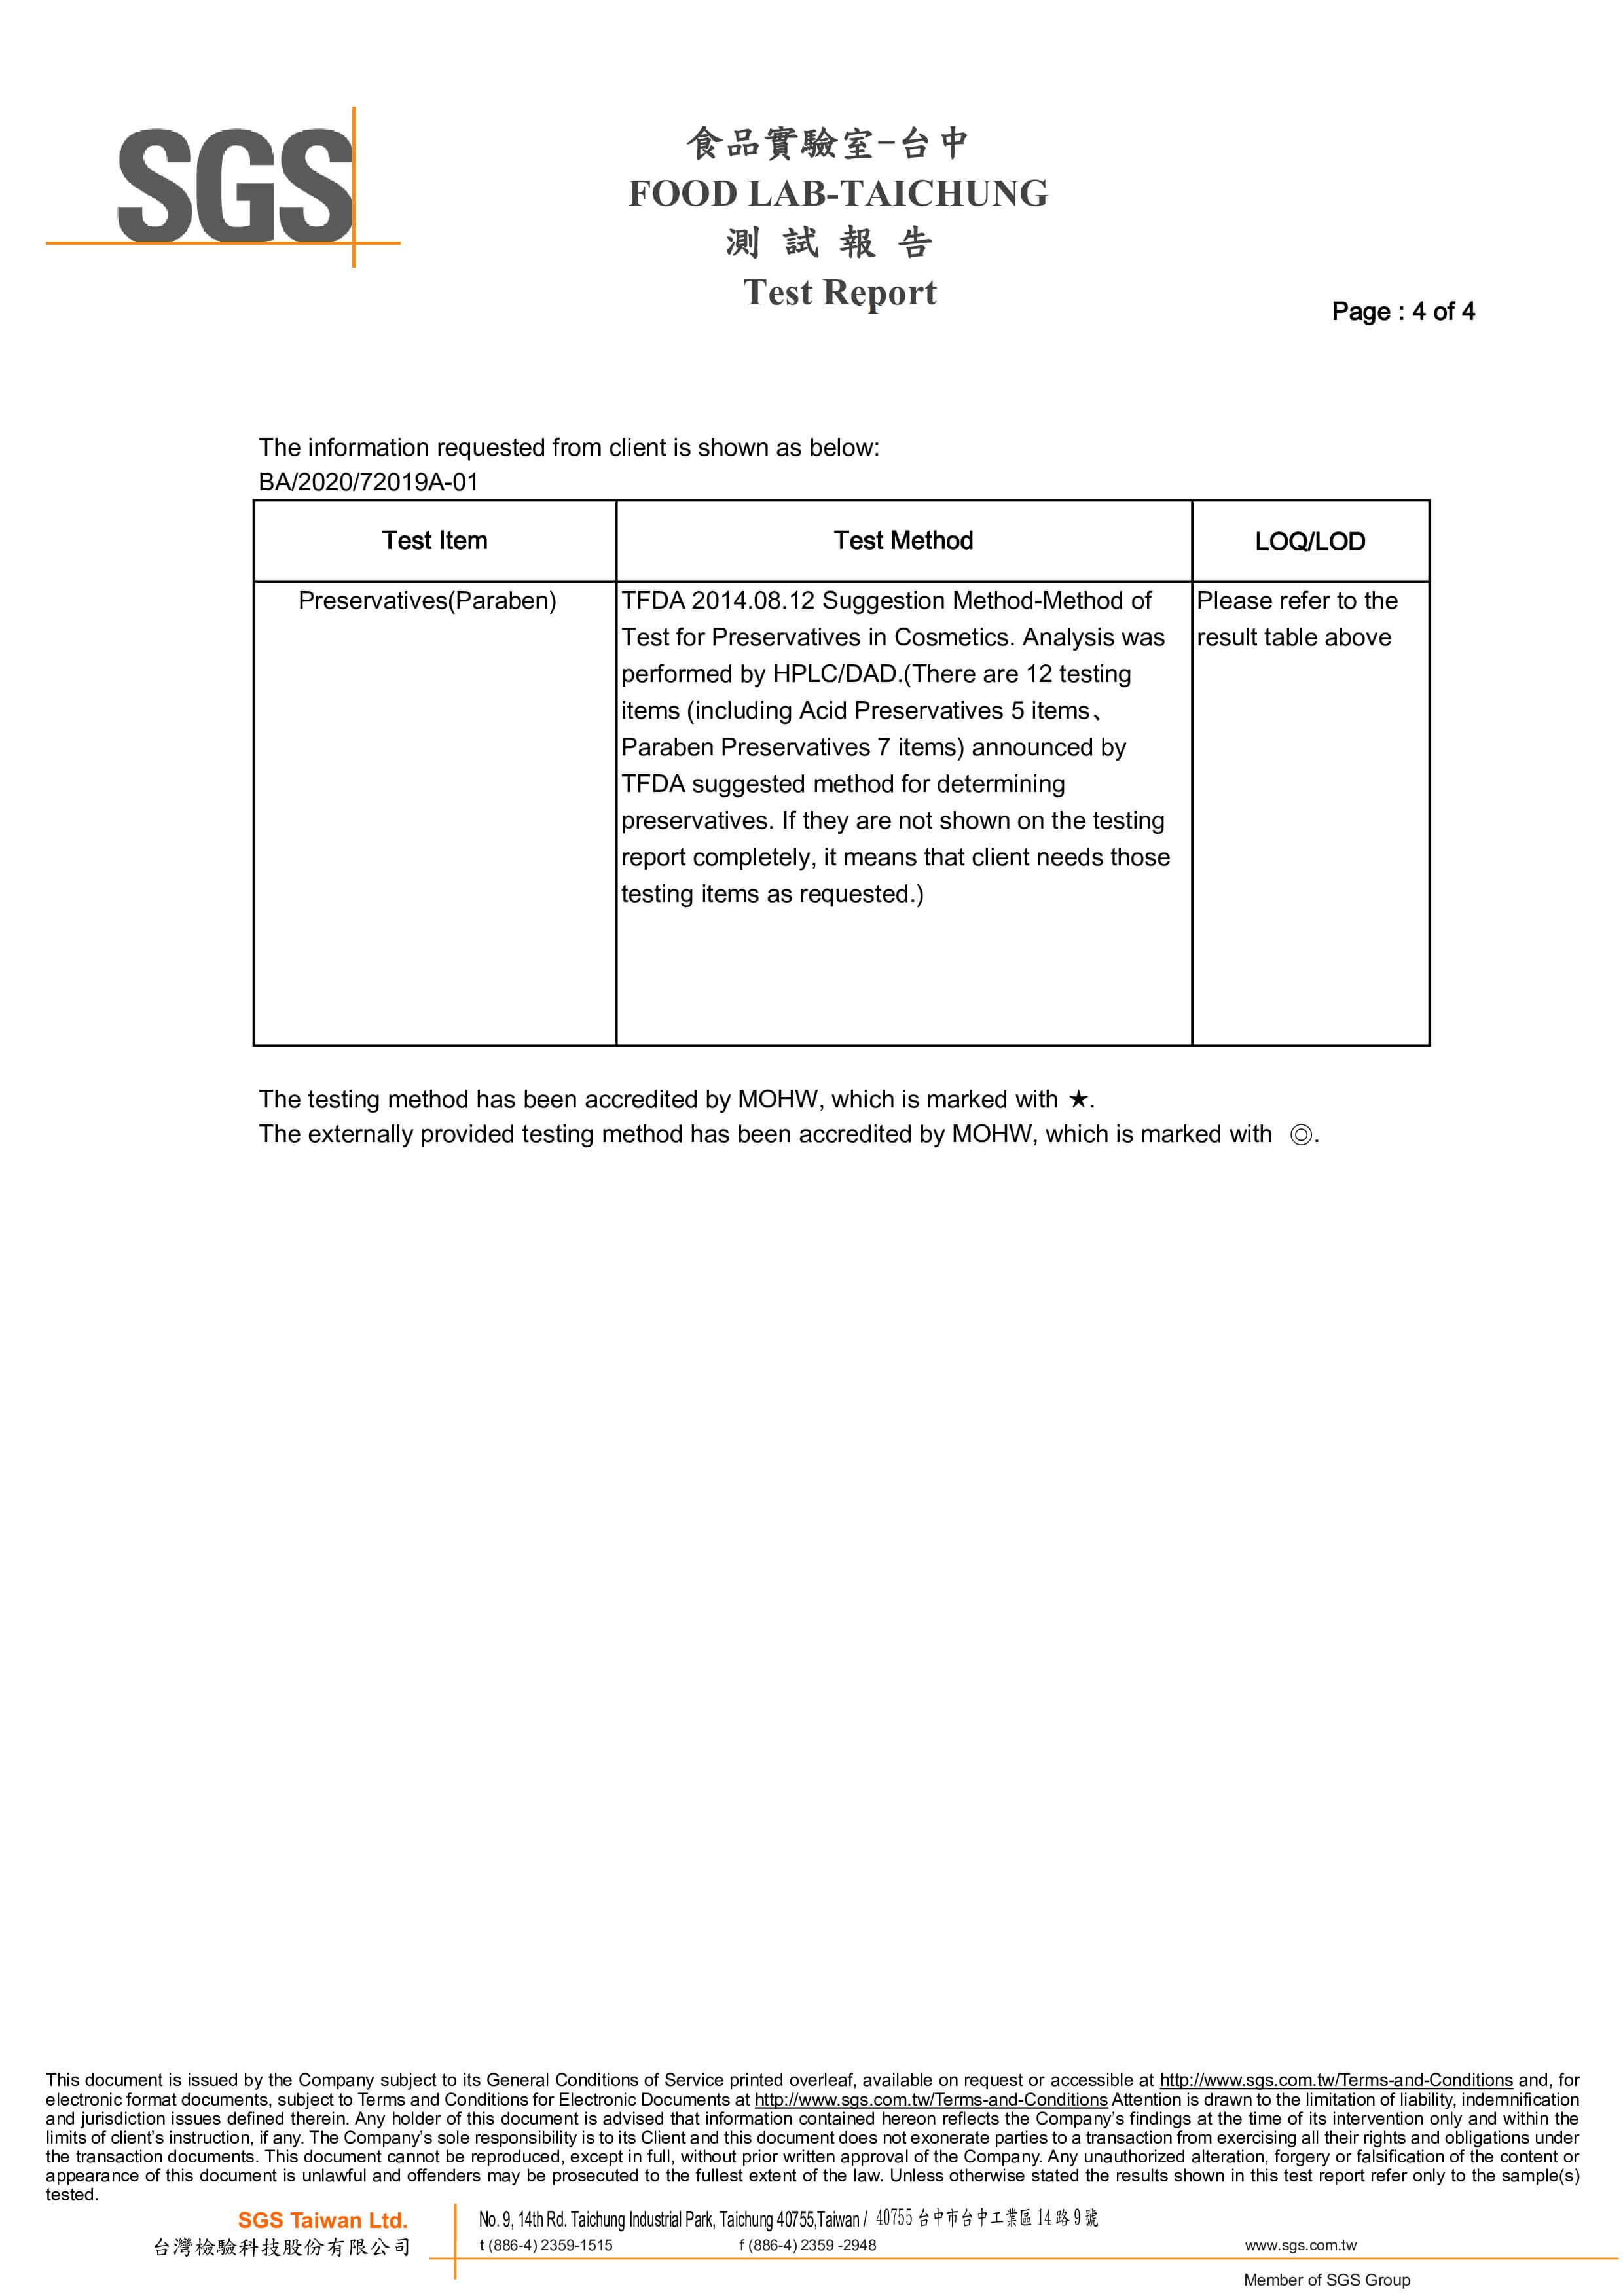 SGS Test Report No.3 p4-4